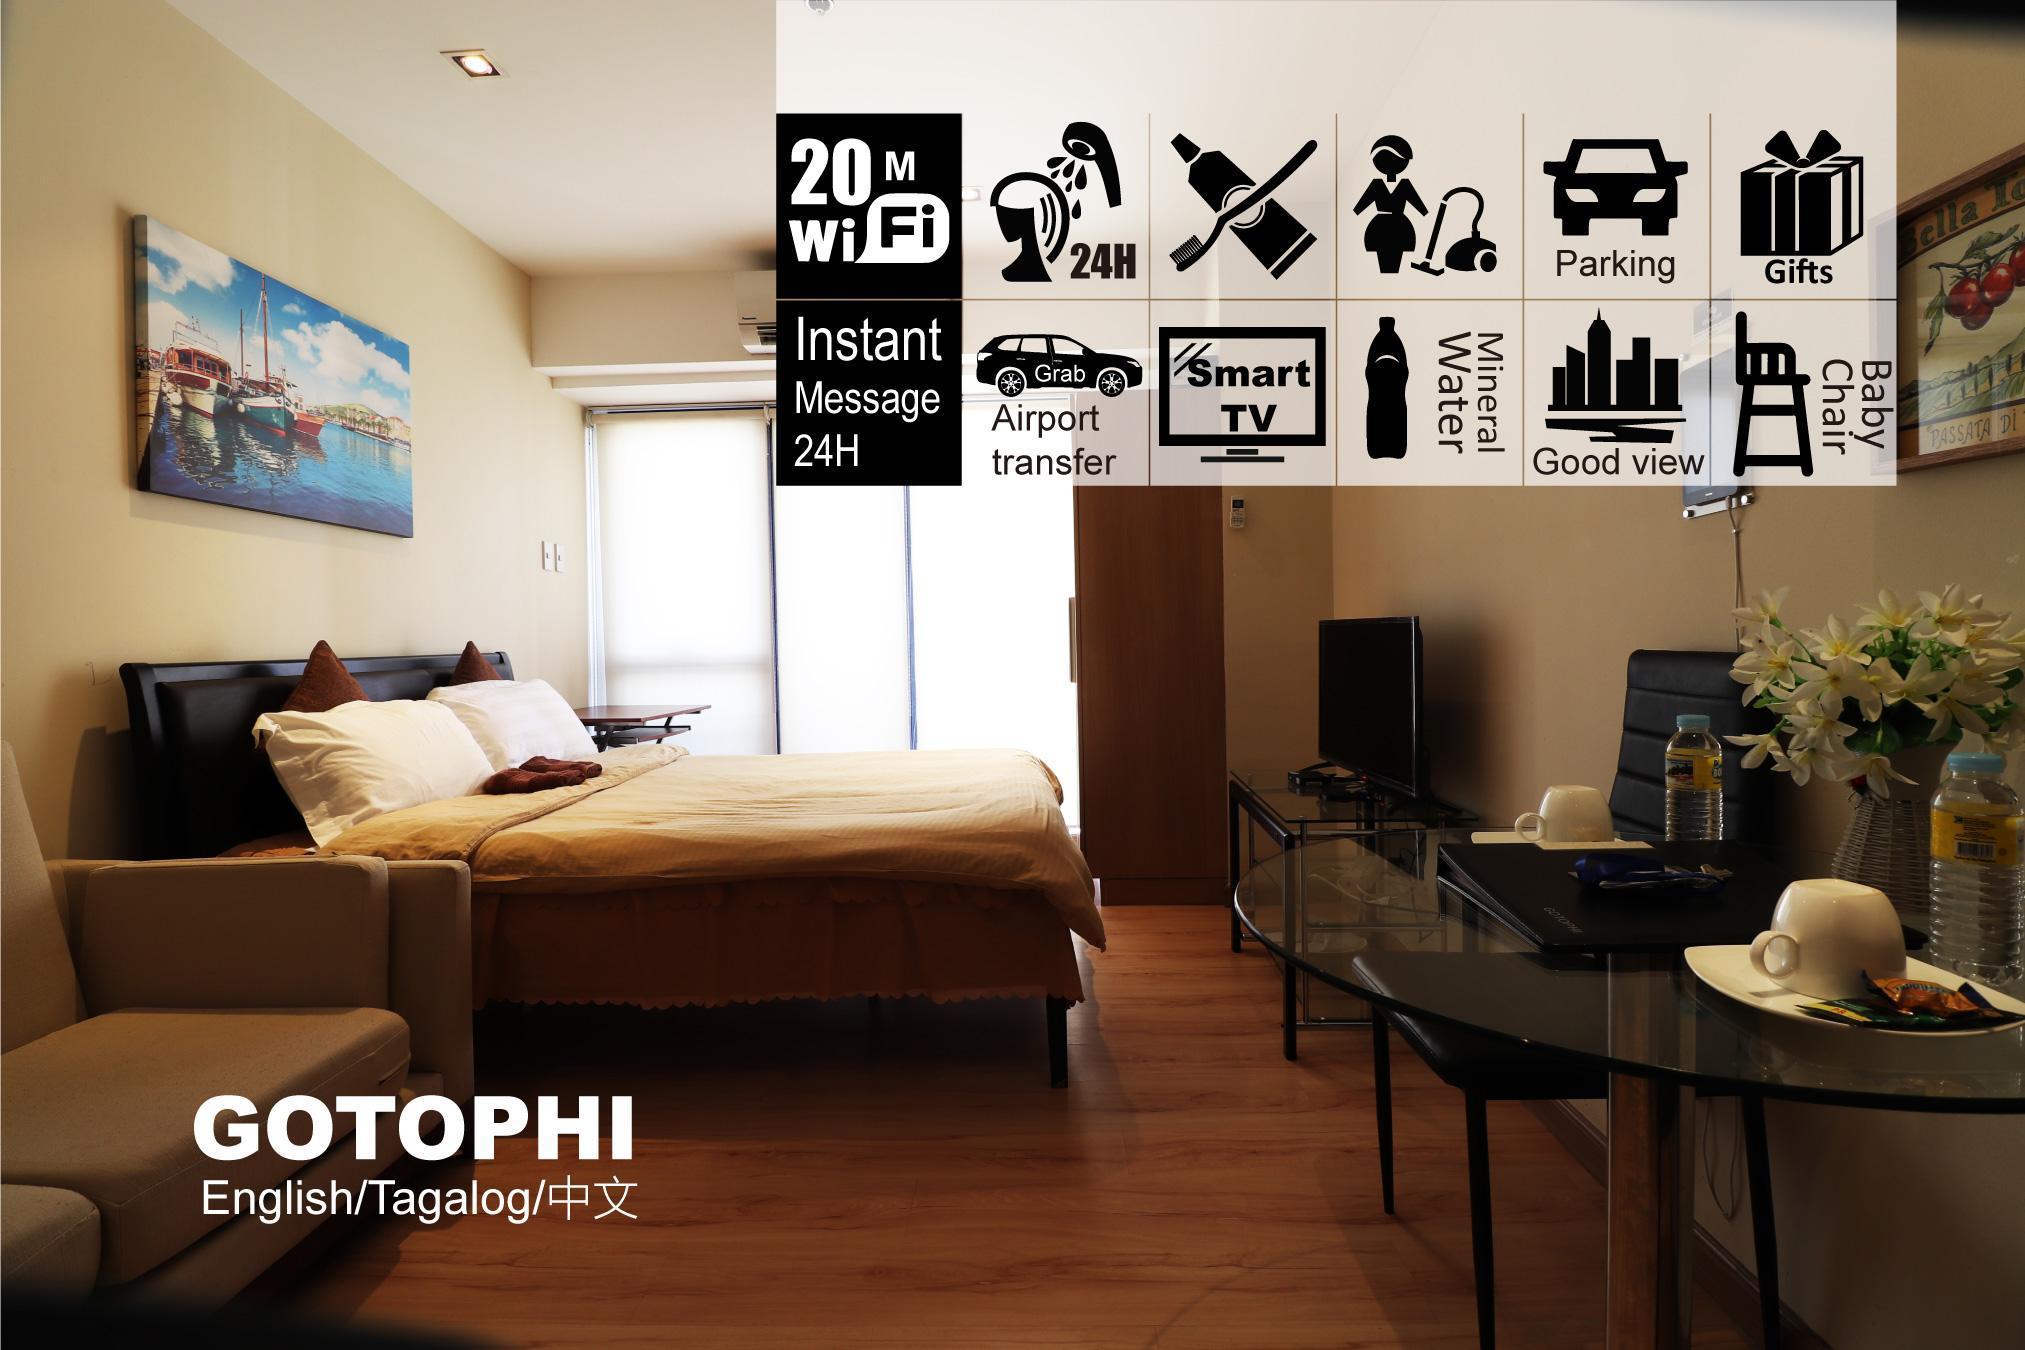 Gotophi Luxurious Hotel Knightsbridge Makati 5820